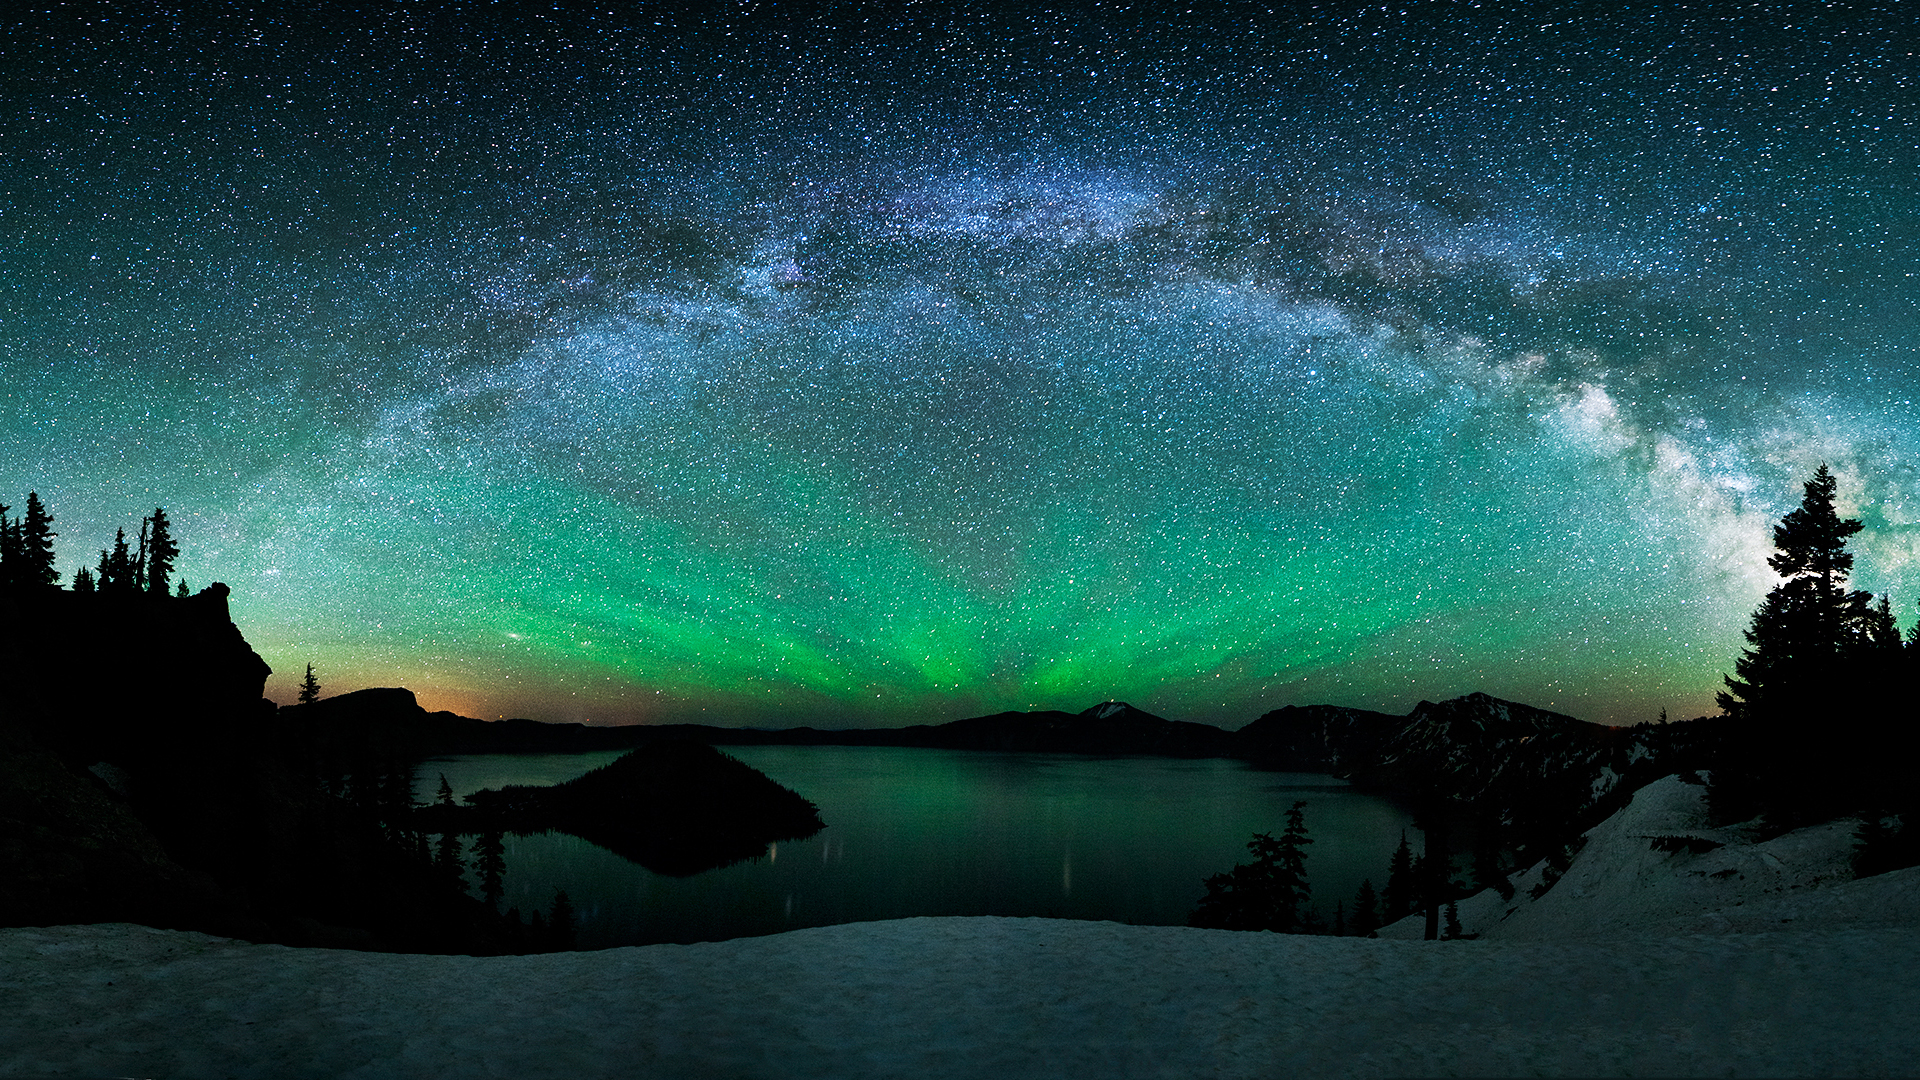 northern lights wallpaper 4k - photo #21